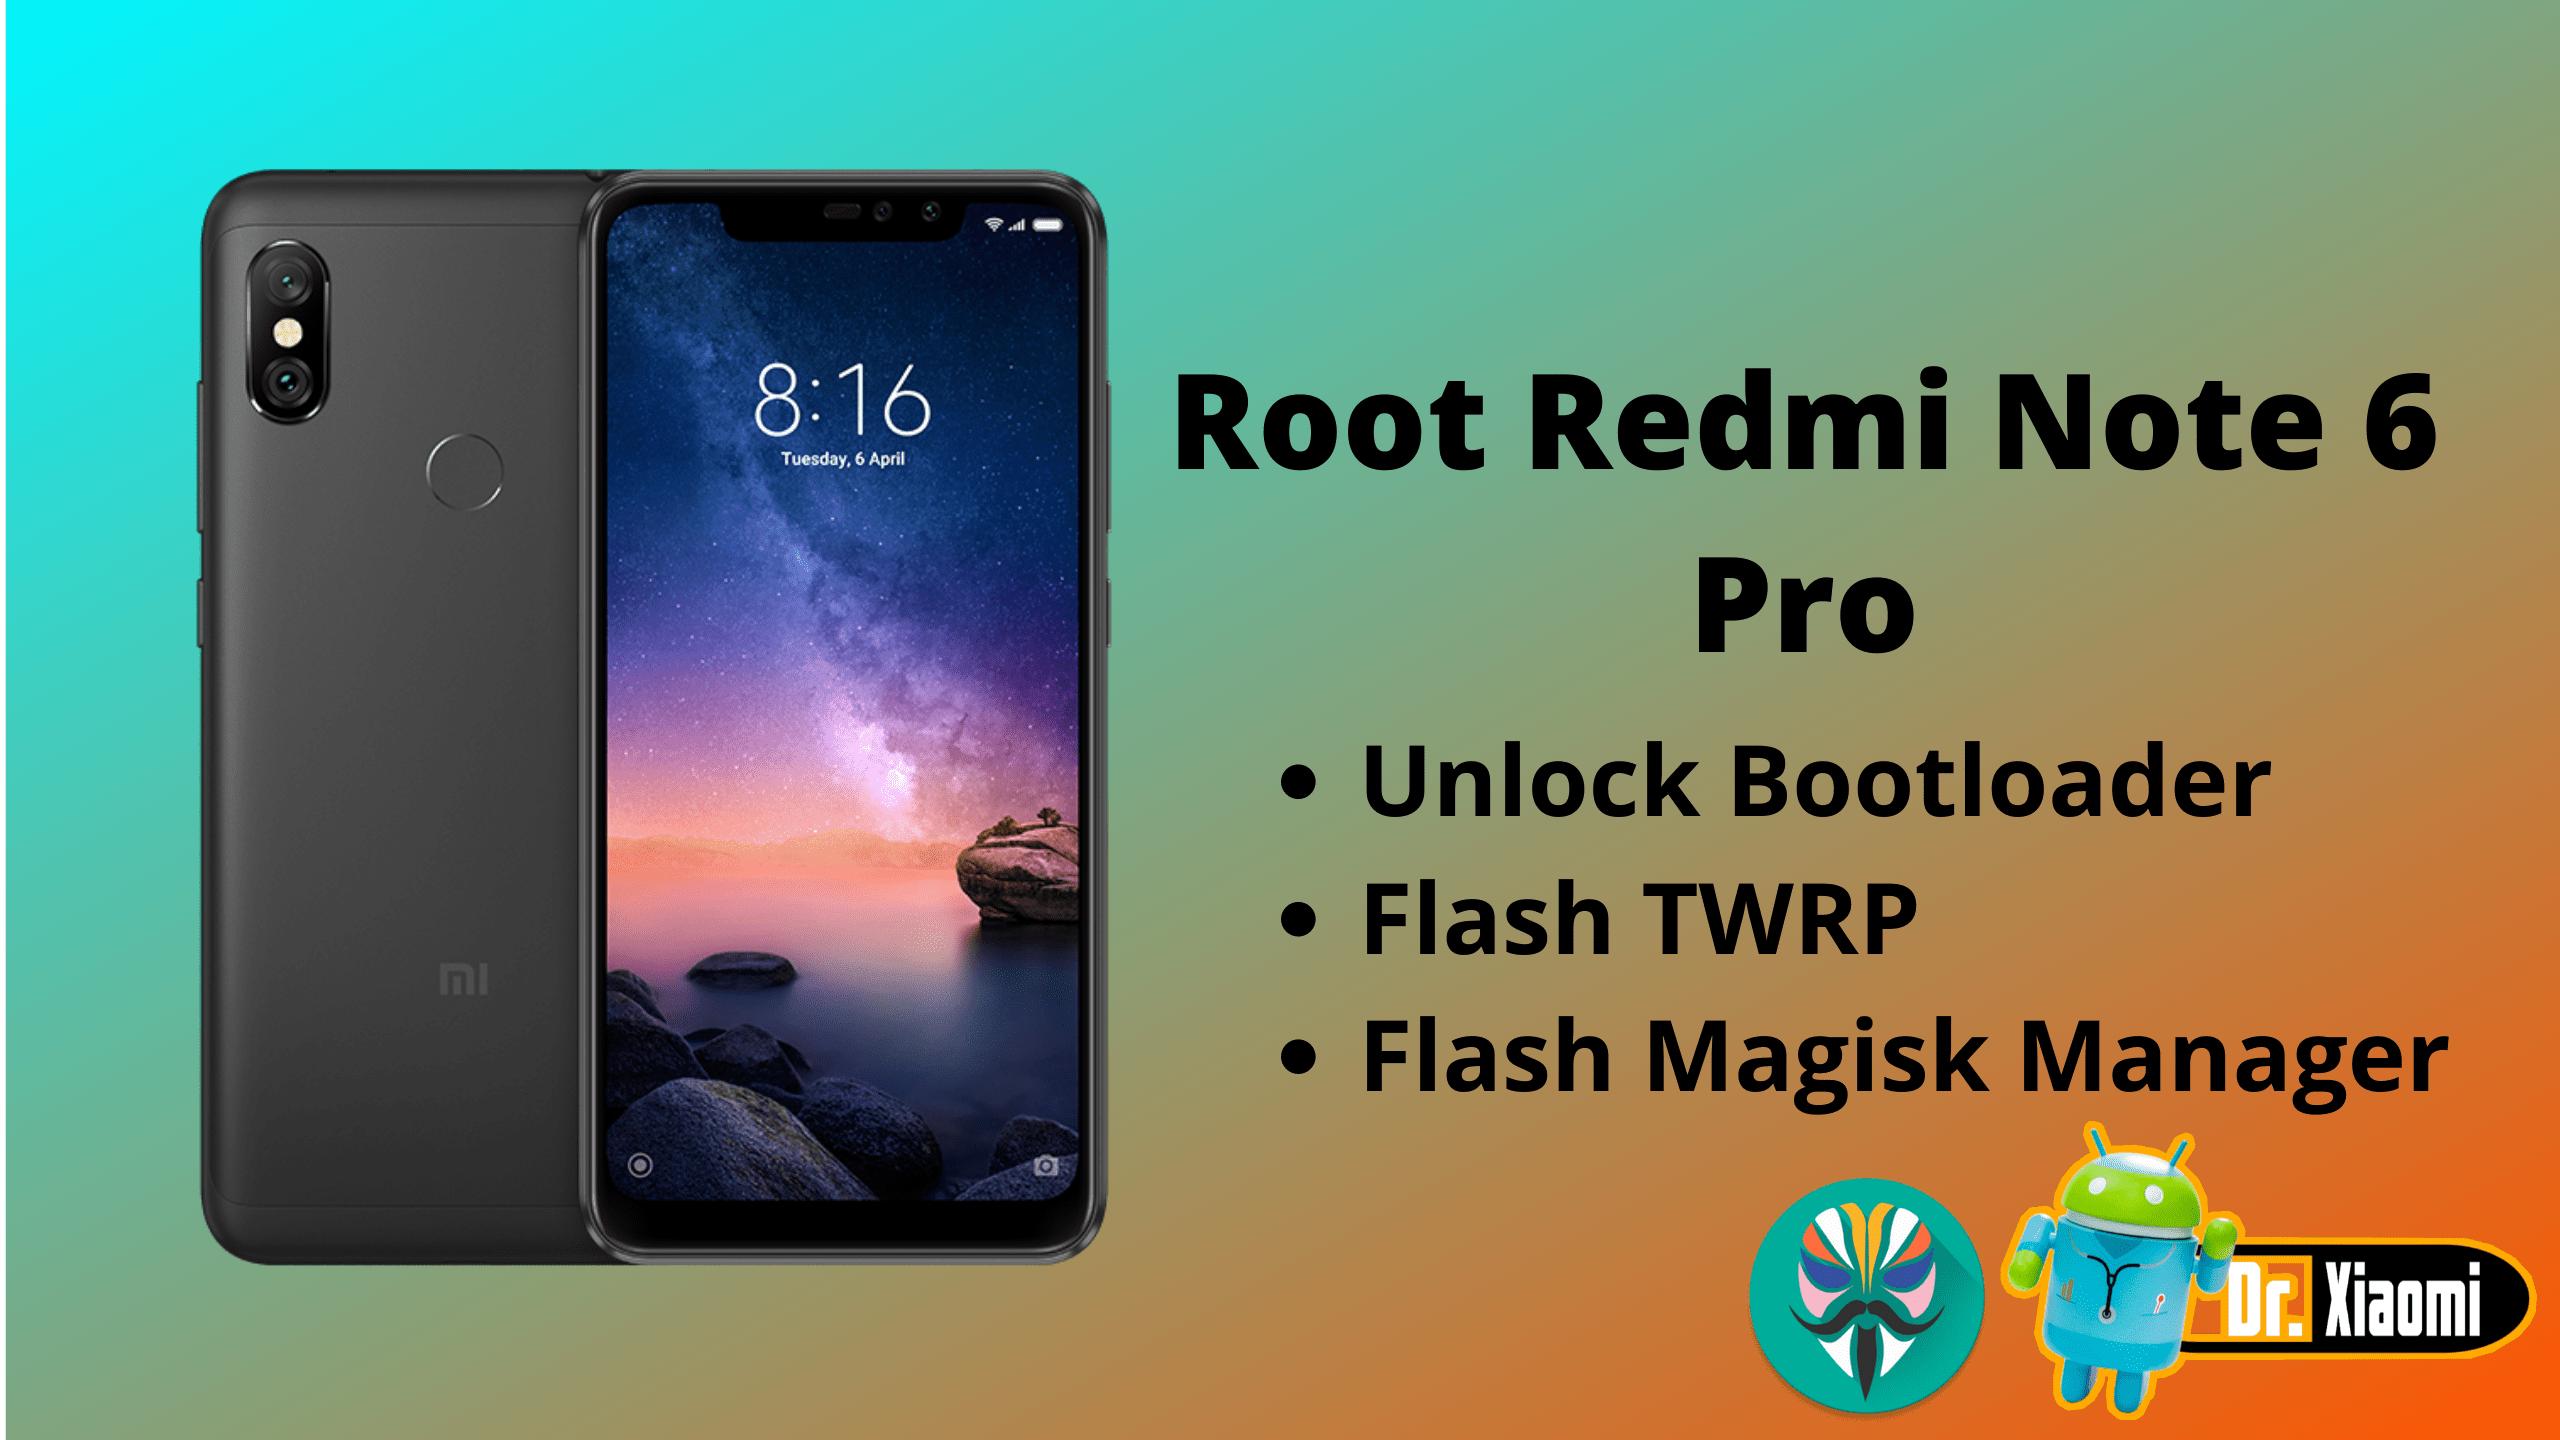 Root Redmi Note 6 Pro